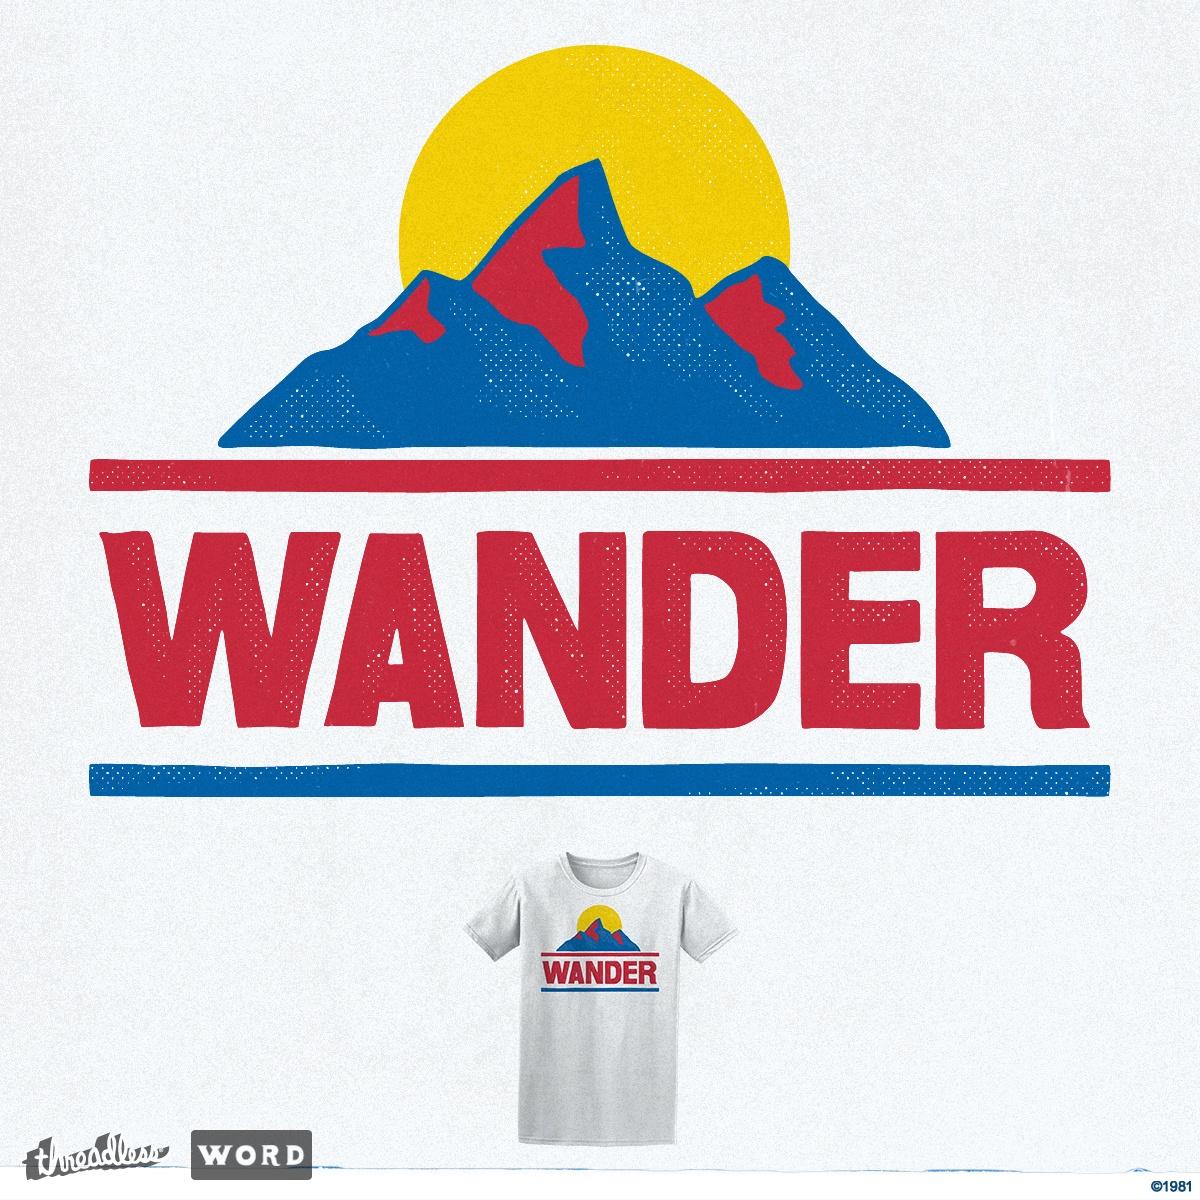 Wander by arzie13 on Threadless